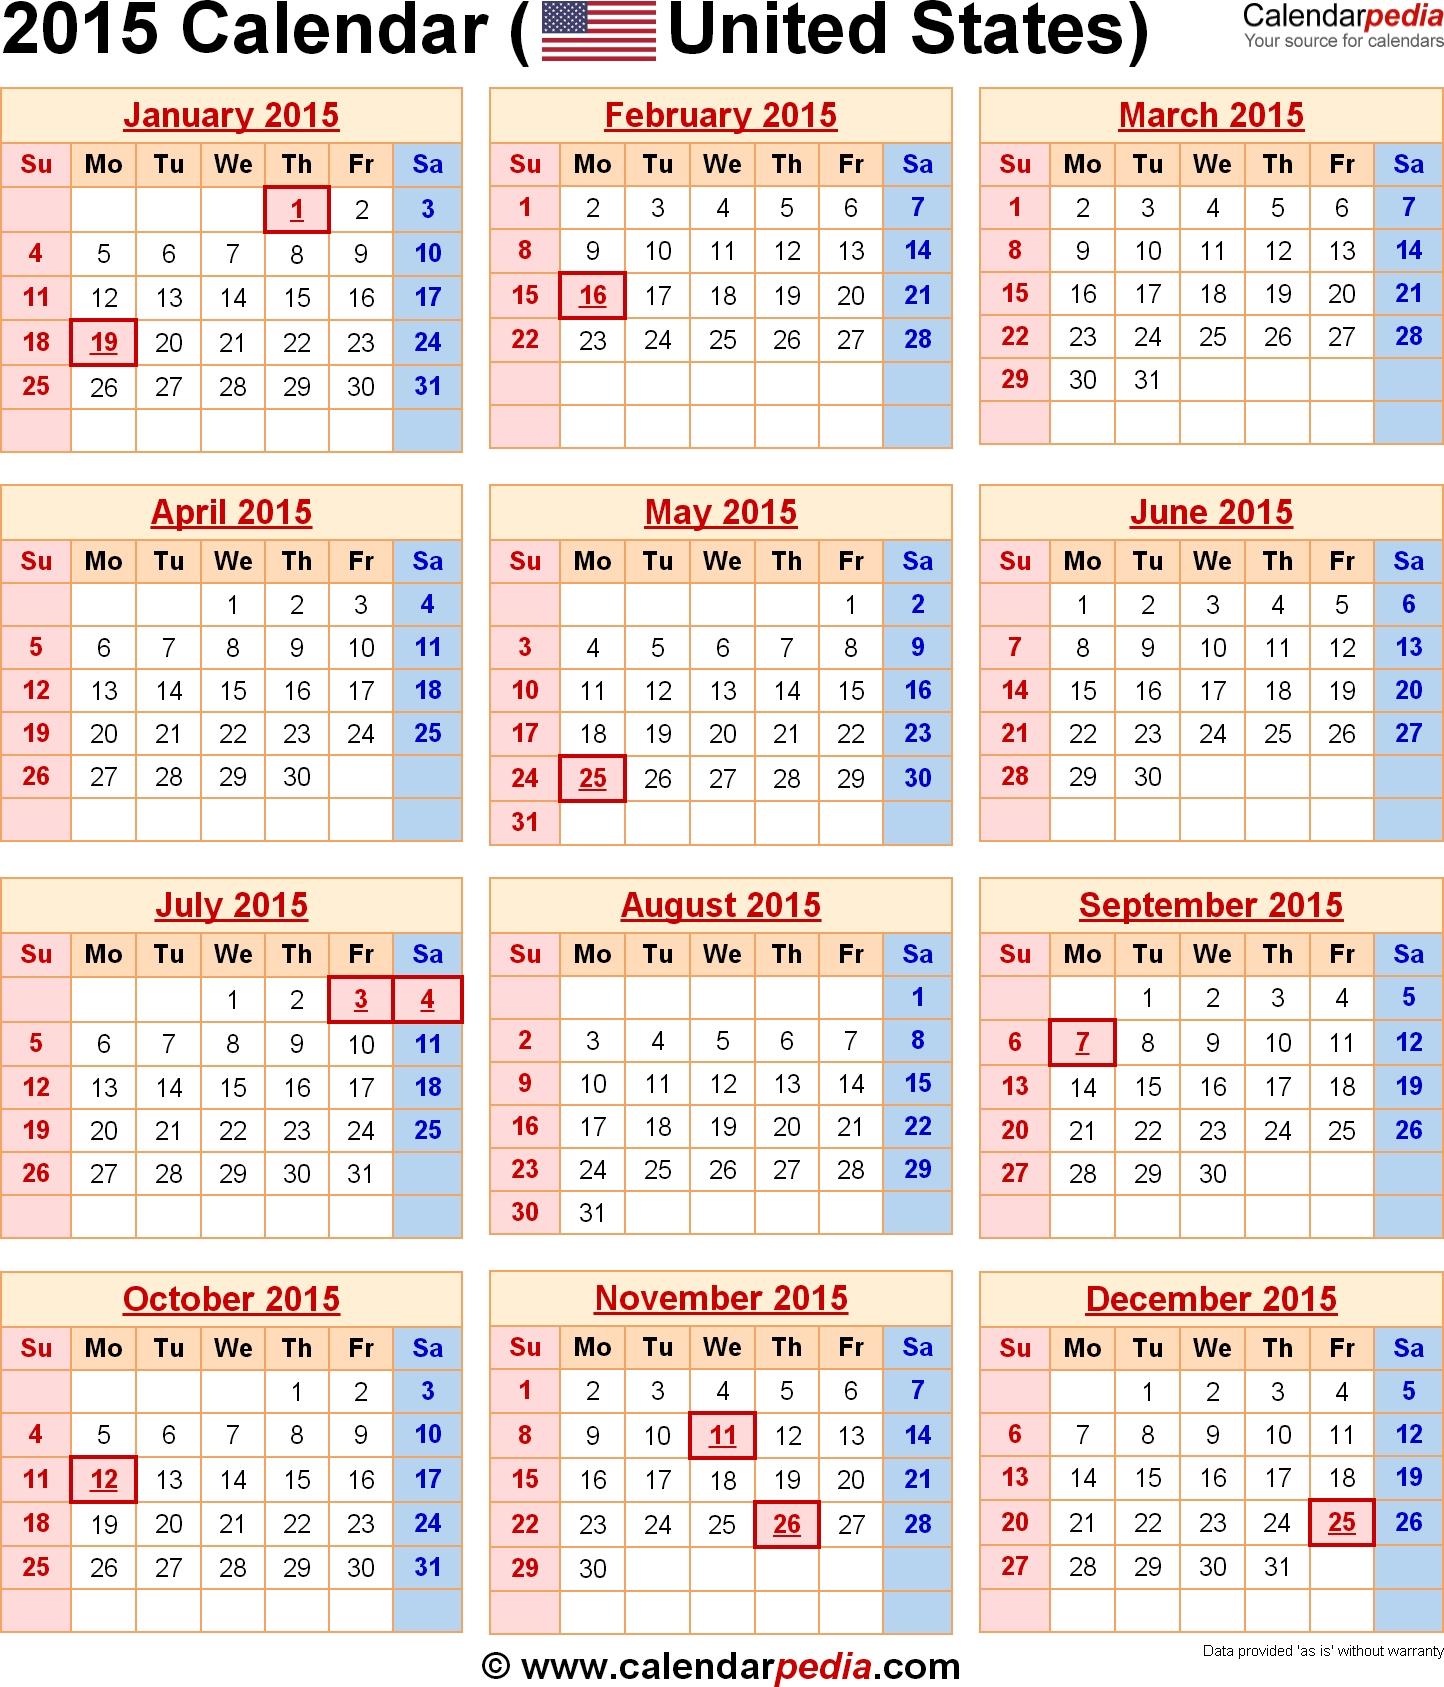 2015 Calendars 2015 Calendar With Federal Holidays Excelpdf